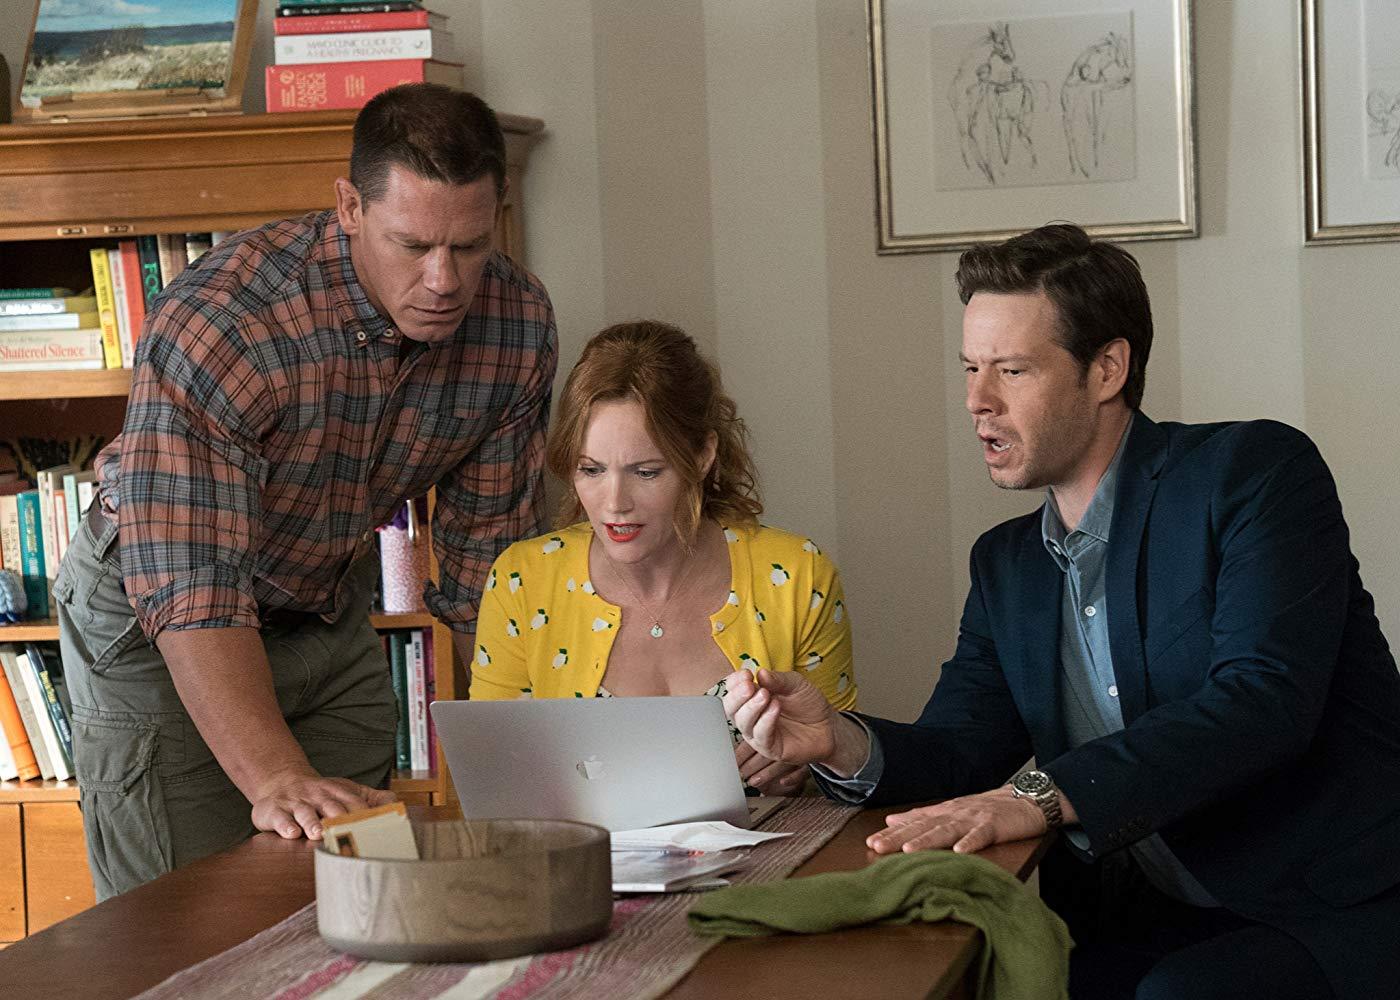 Leslie Mann, Ike Barinholtz, and John Cena huddle around a laptop.